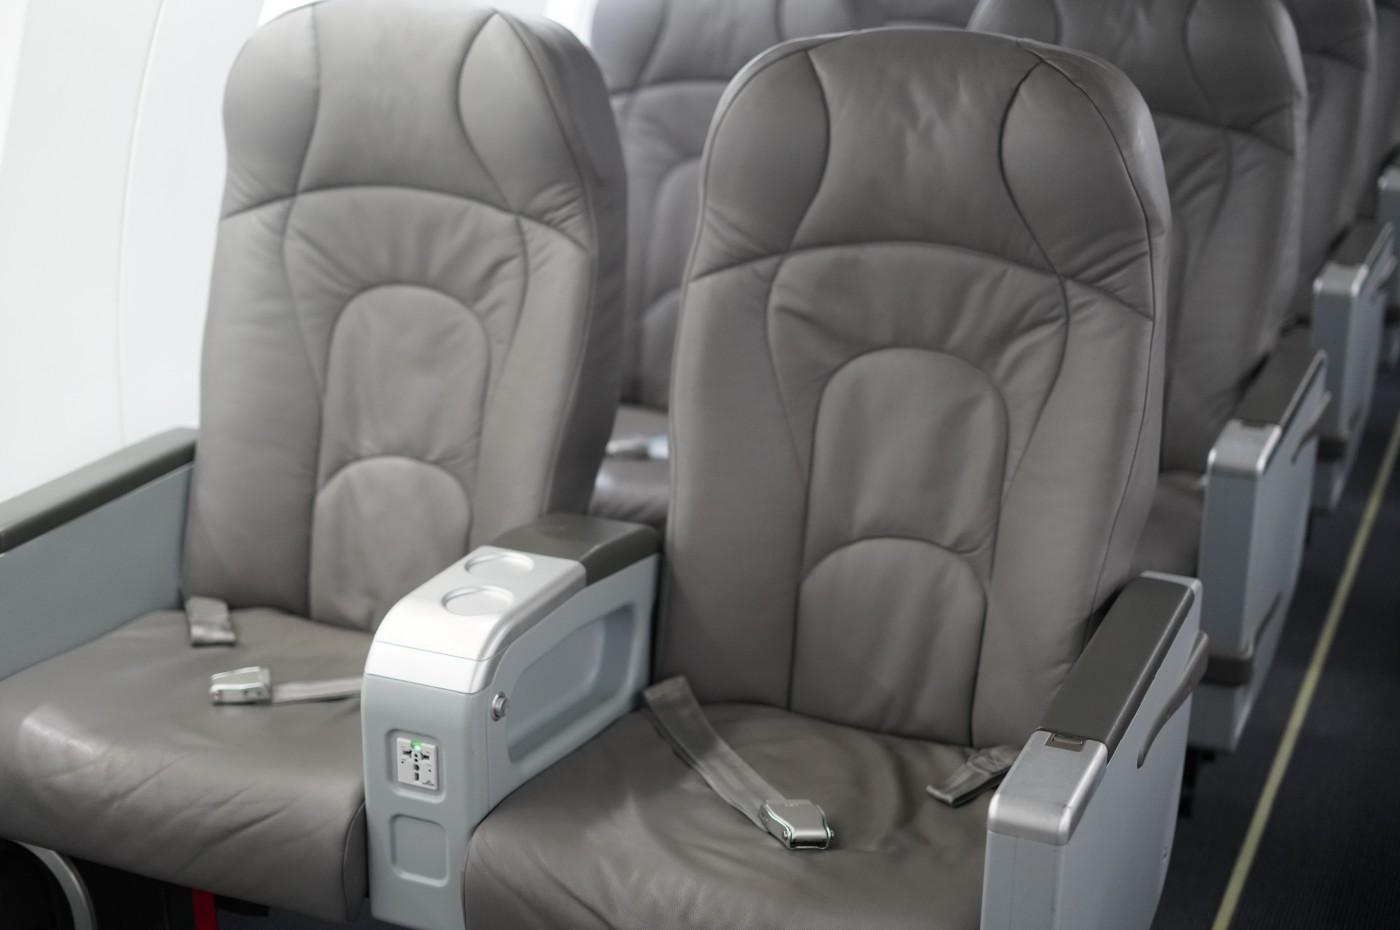 CRJ 700 Seat